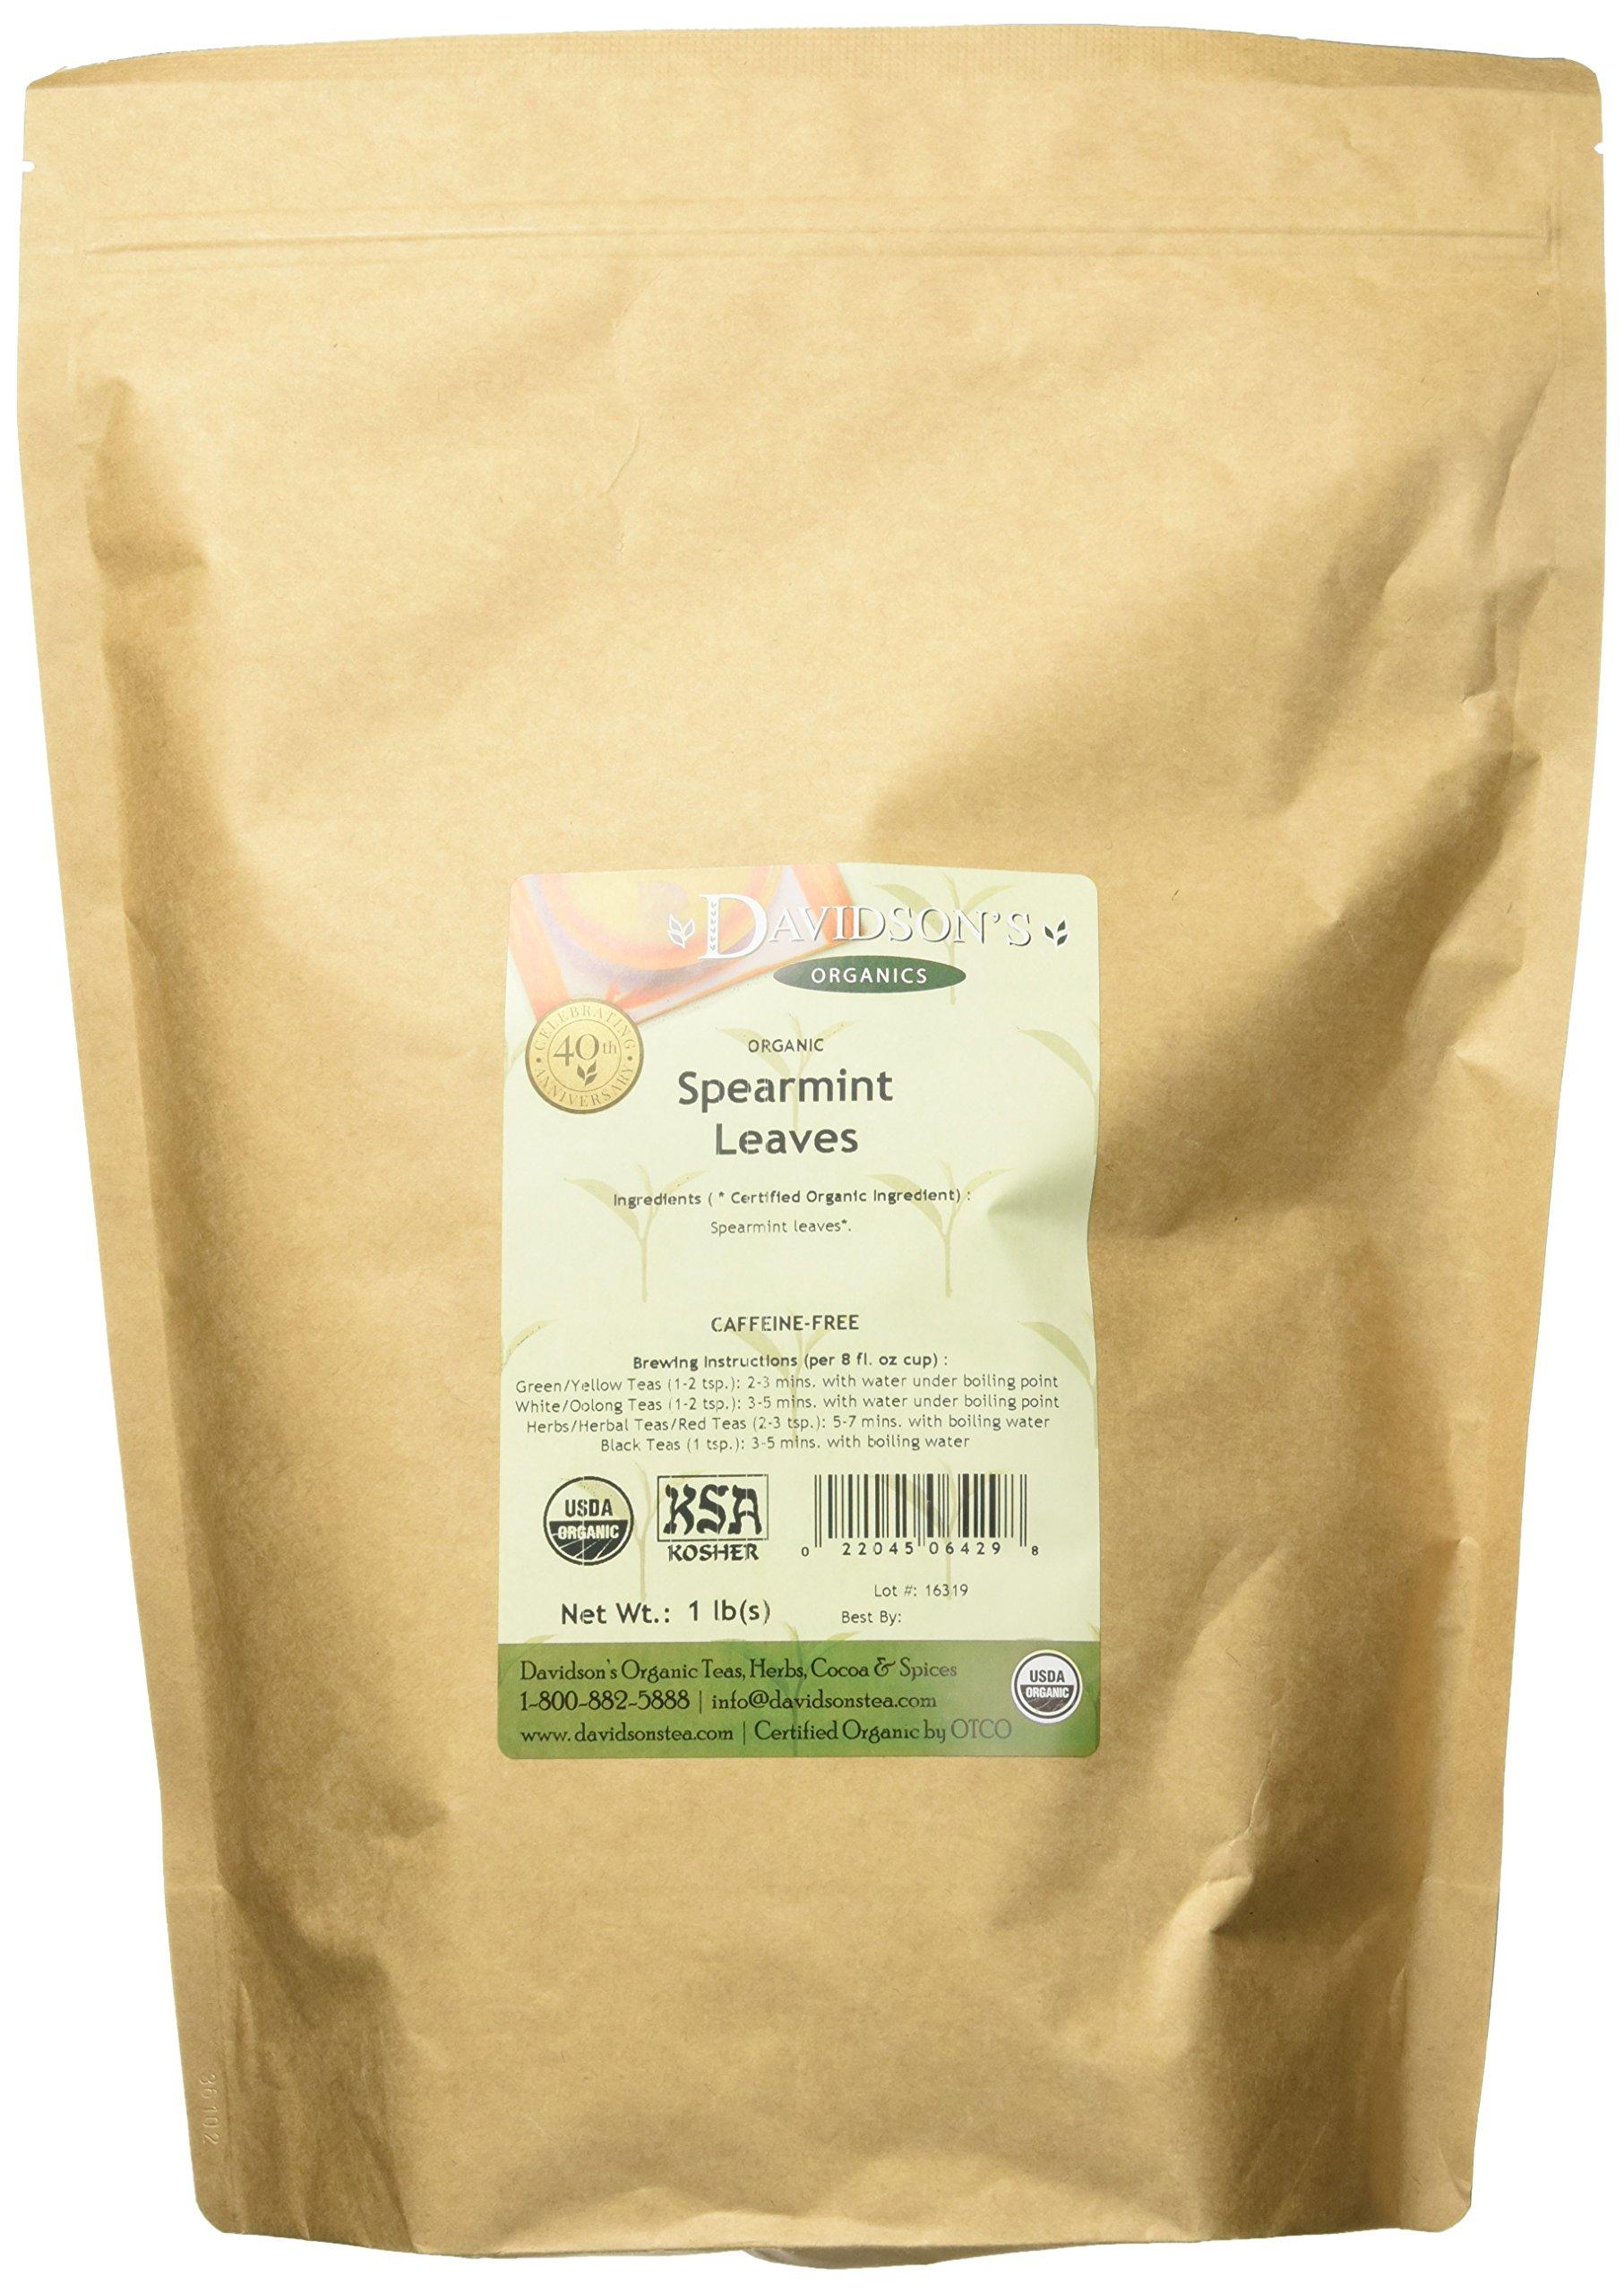 Bulk herbs spices organic organic herbal tea - Davidson S Tea Bulk Organic Spearmint Leaves 16 Ounce Bag